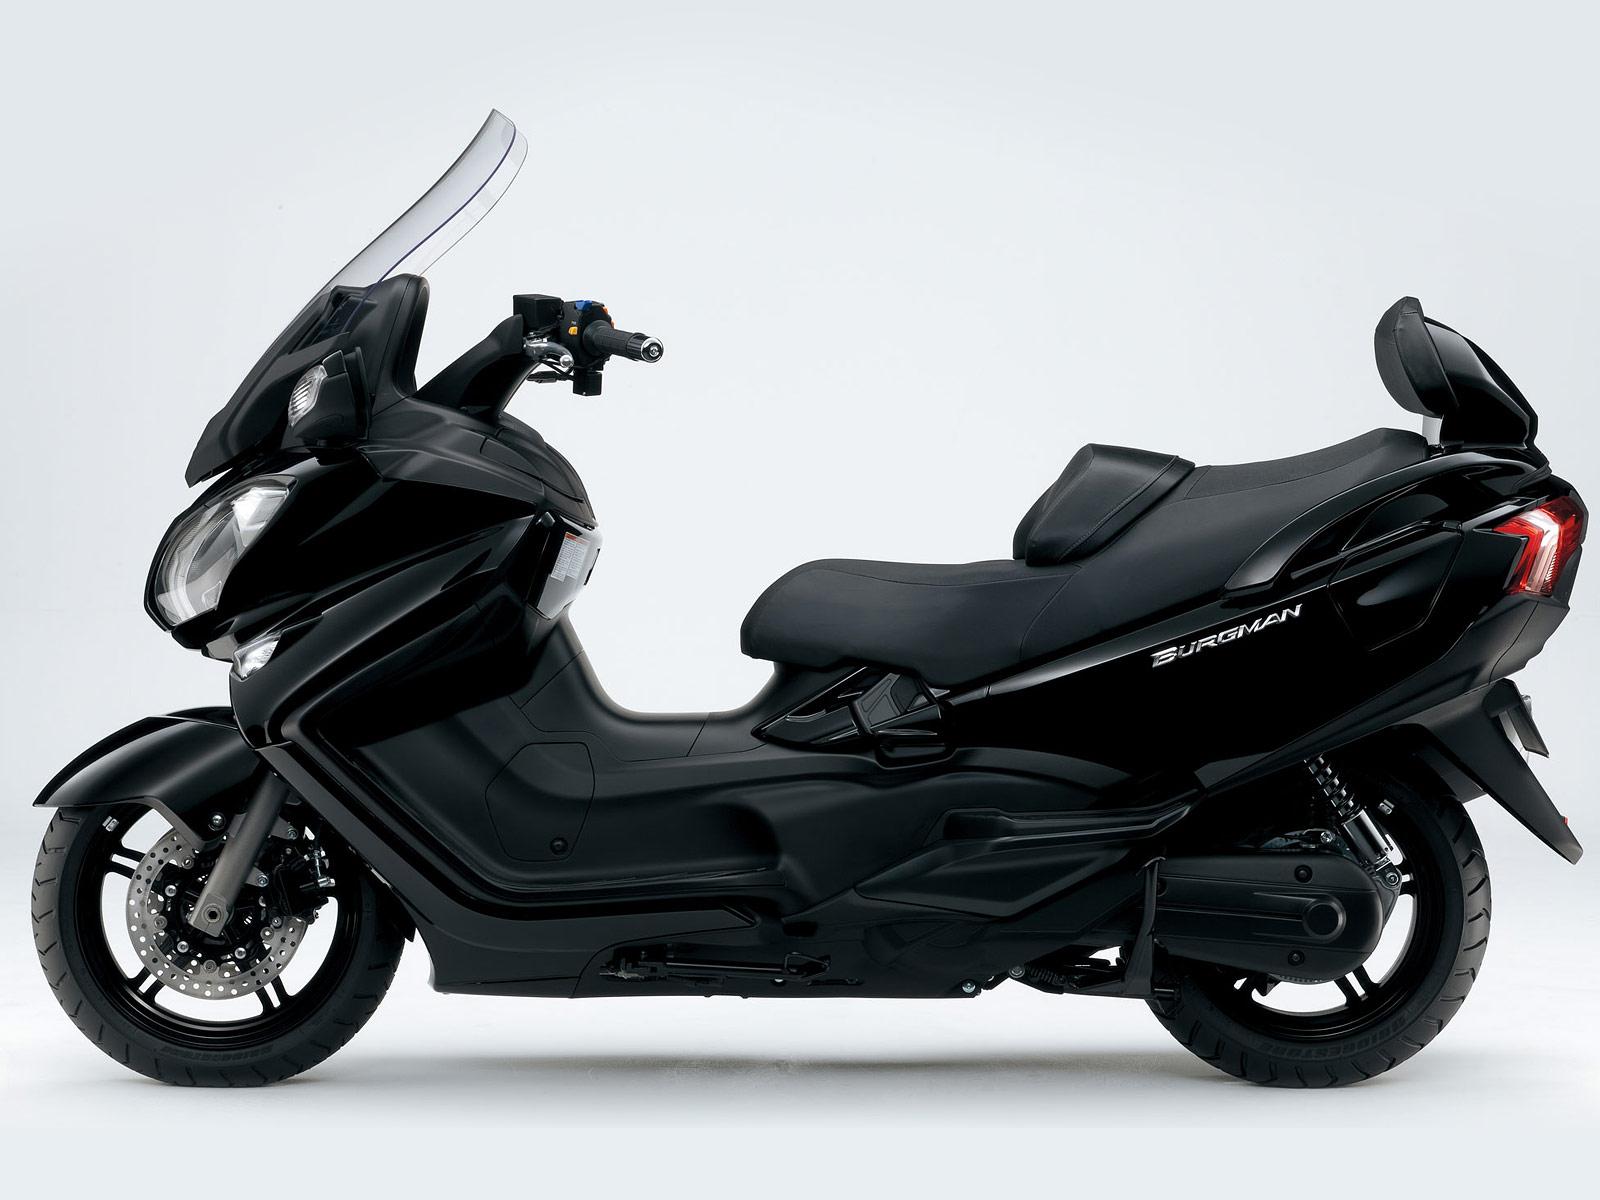 2013 suzuki burgman 650 executive abs scooter pictures. Black Bedroom Furniture Sets. Home Design Ideas